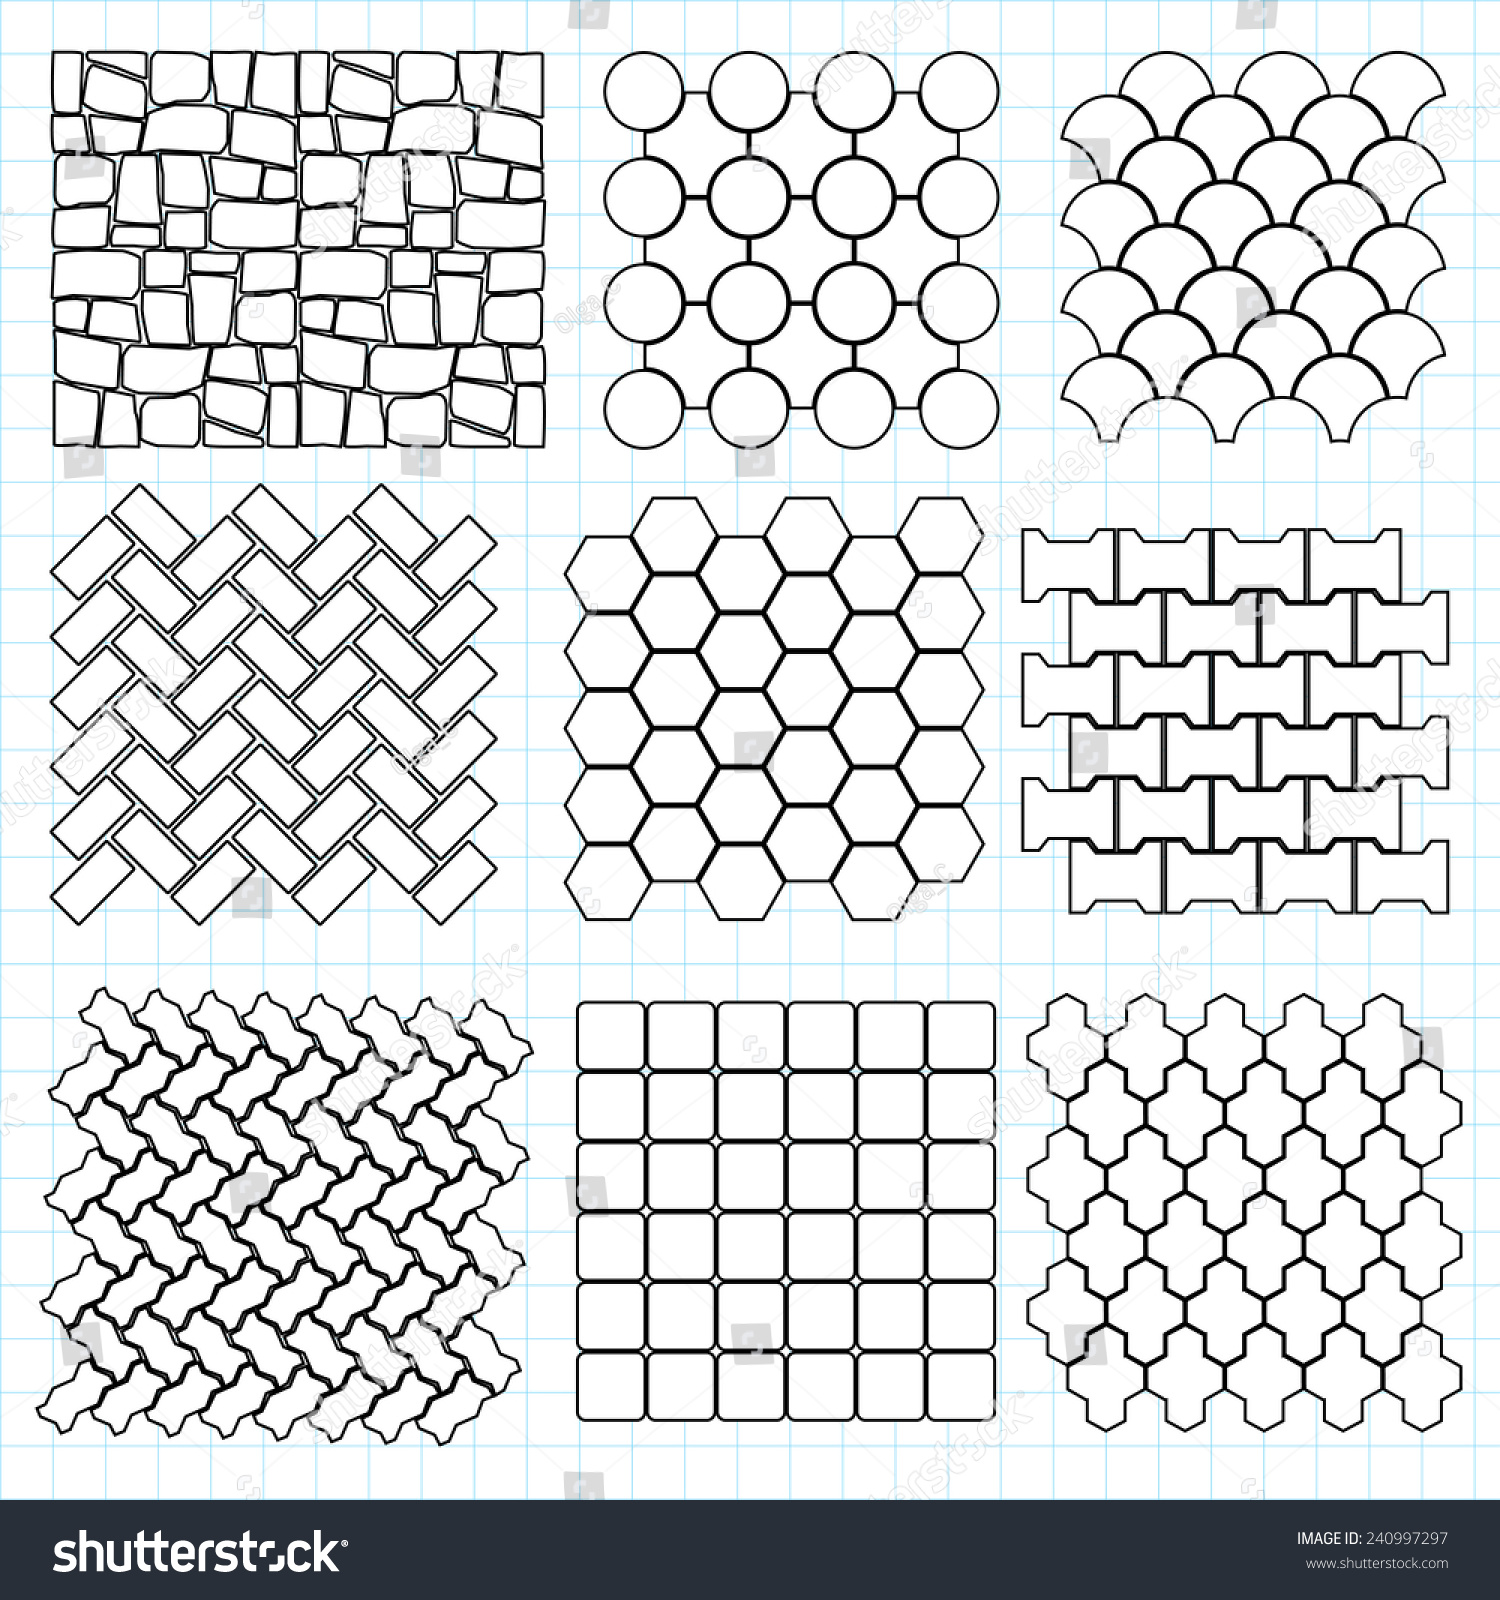 Paving stone landscape design elements make stock vector for Paving planner